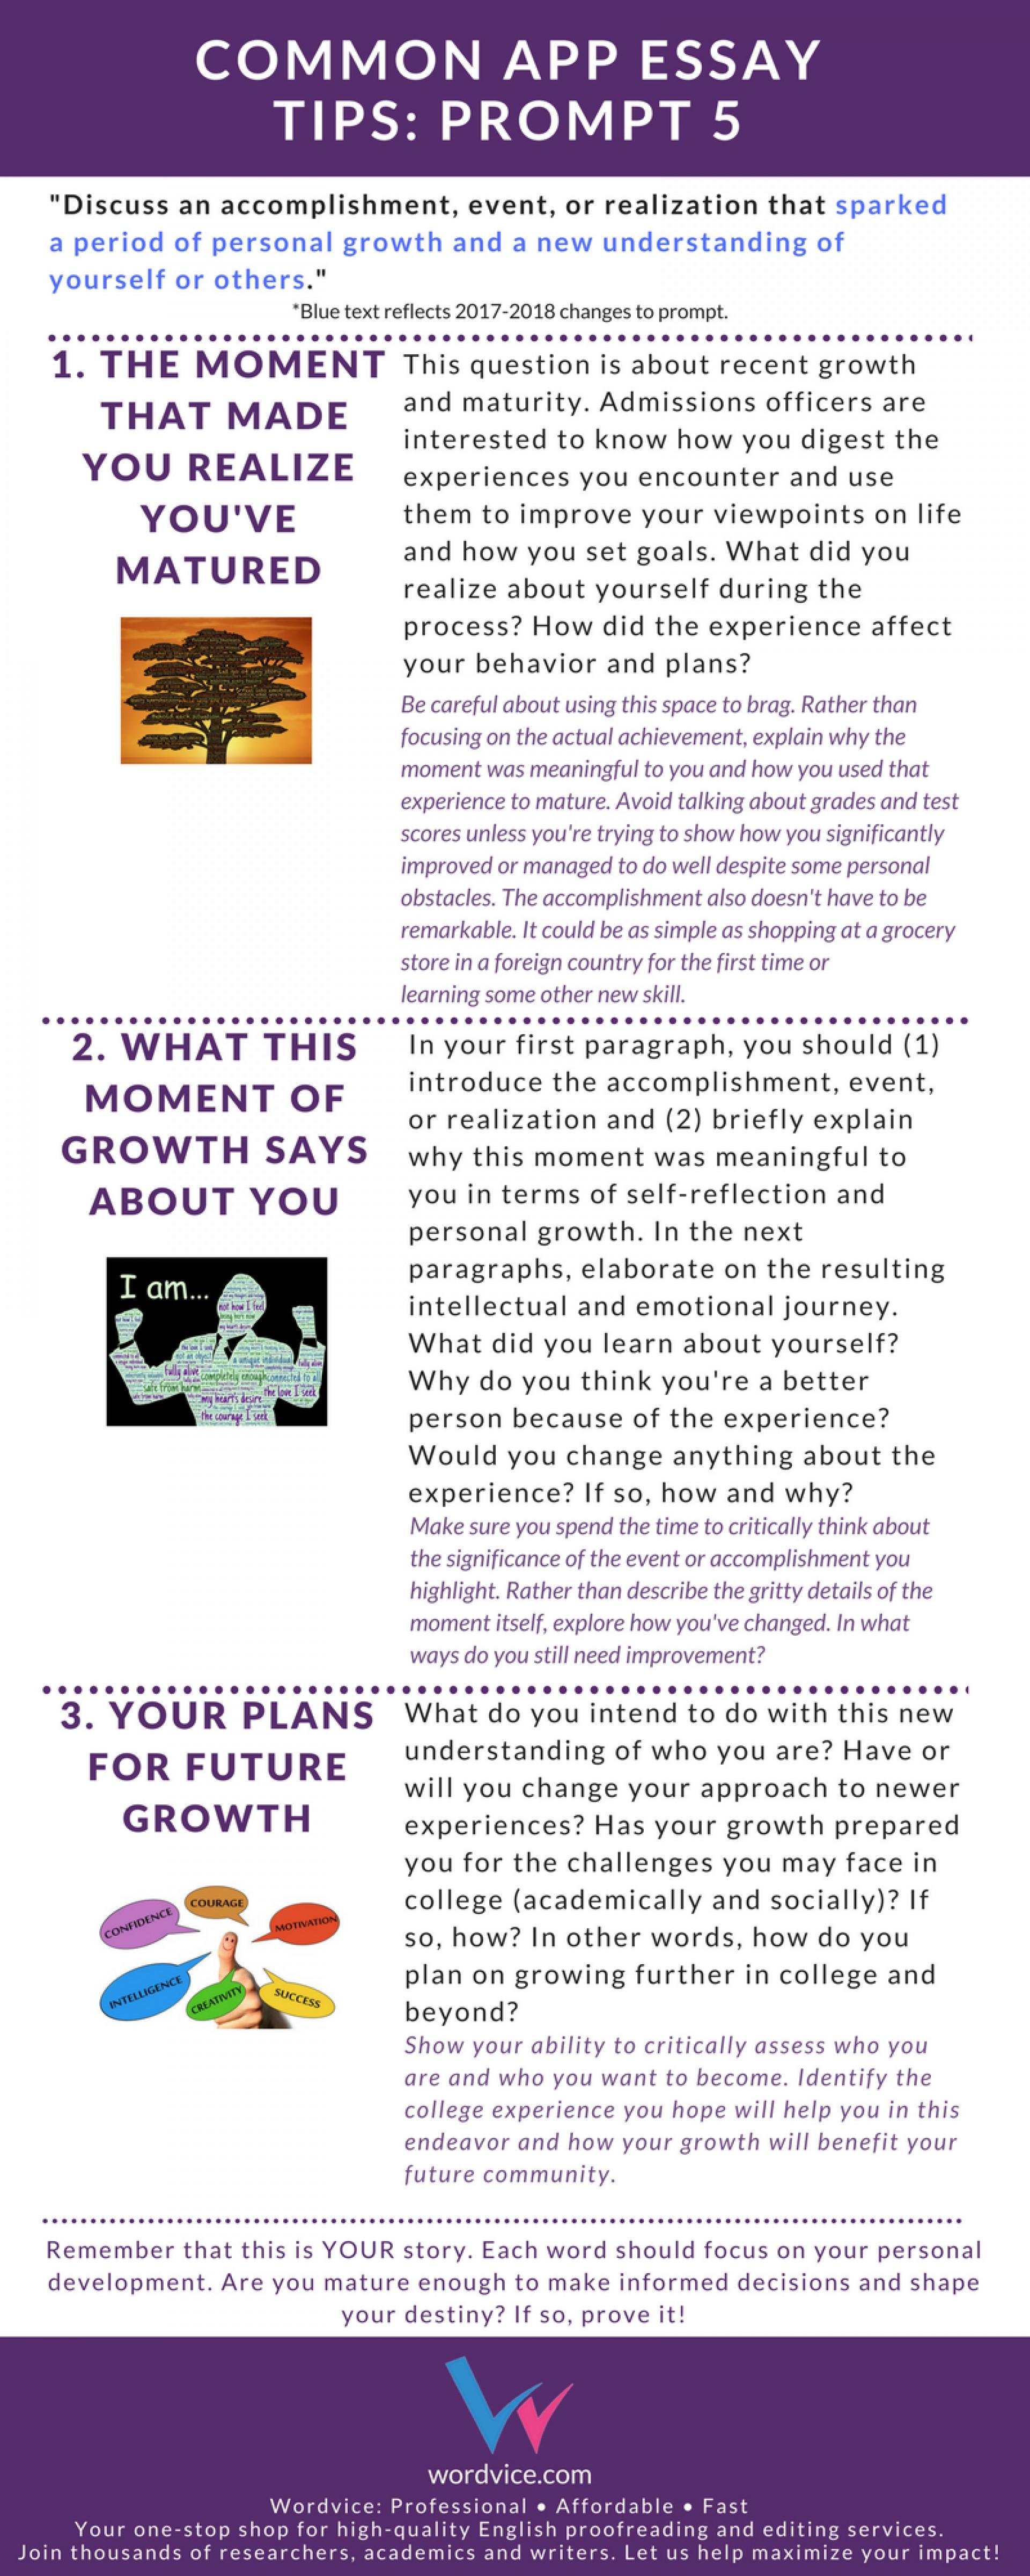 017 Common App Brainstormprompt Essay Prompt Unusual Prompts Usc Examples 1 4 1920